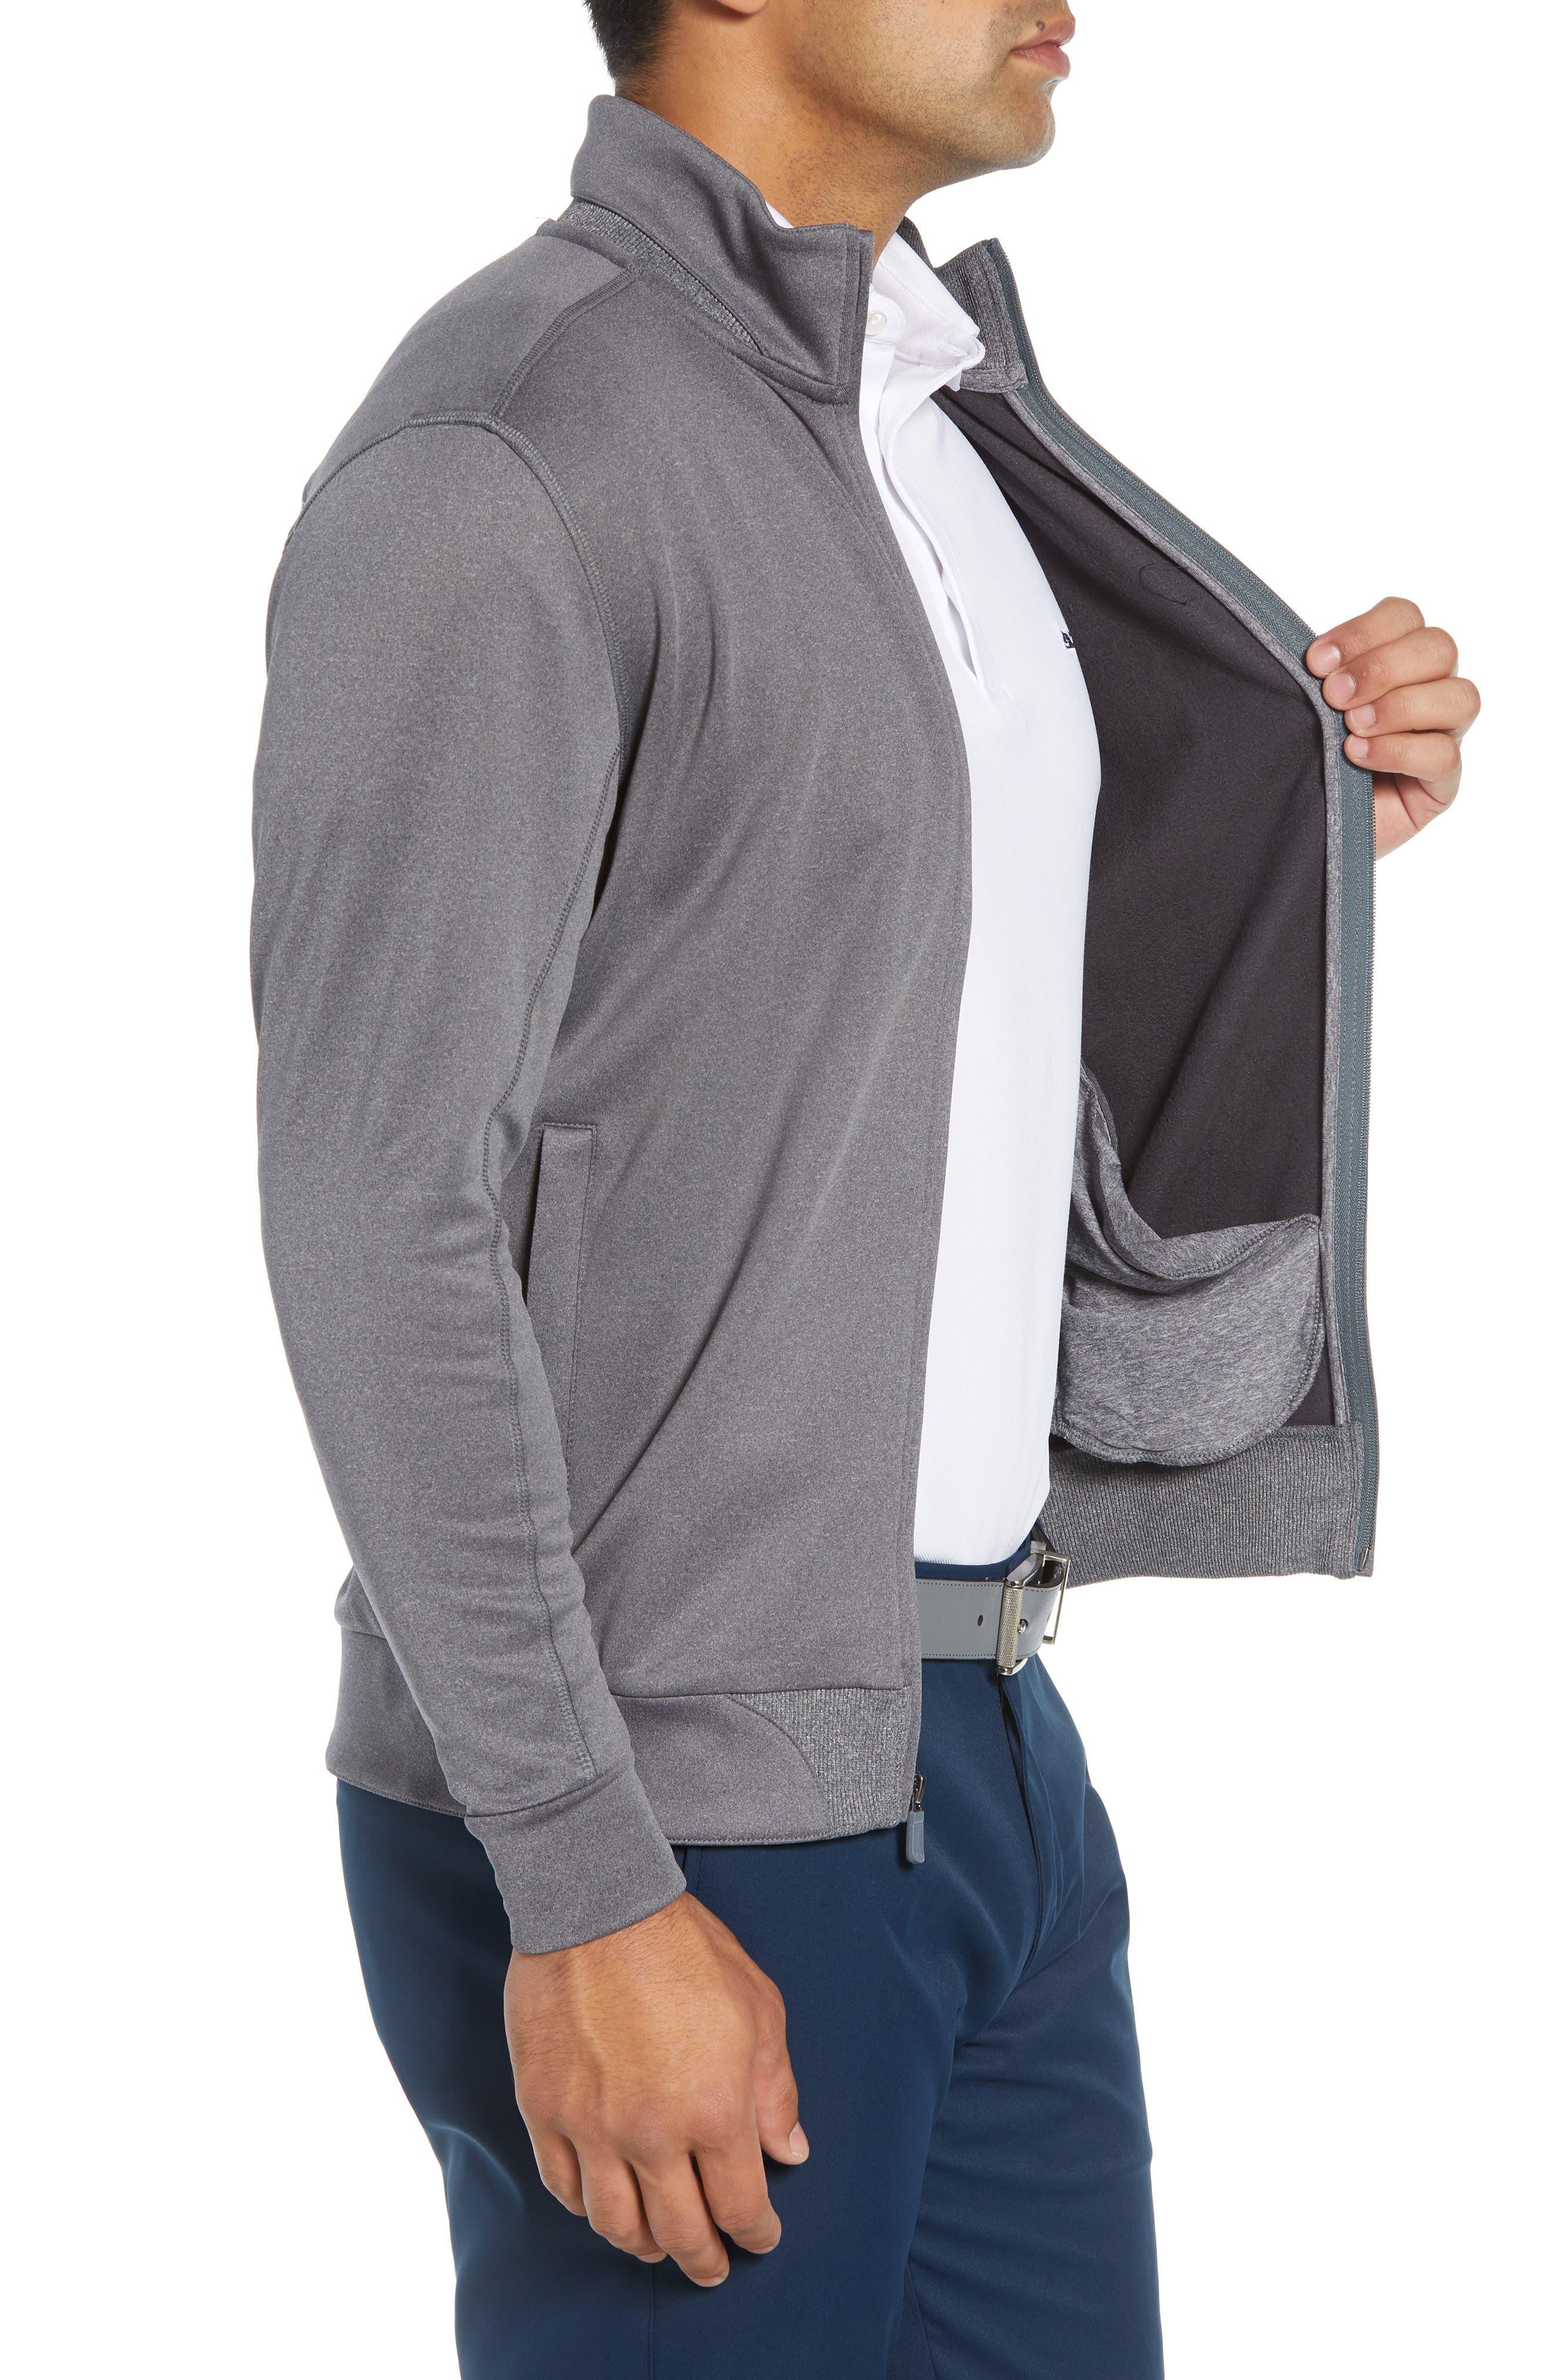 XH20 Denali Performance Jacket,                             Alternate thumbnail 3, color,                             GRAPHITE